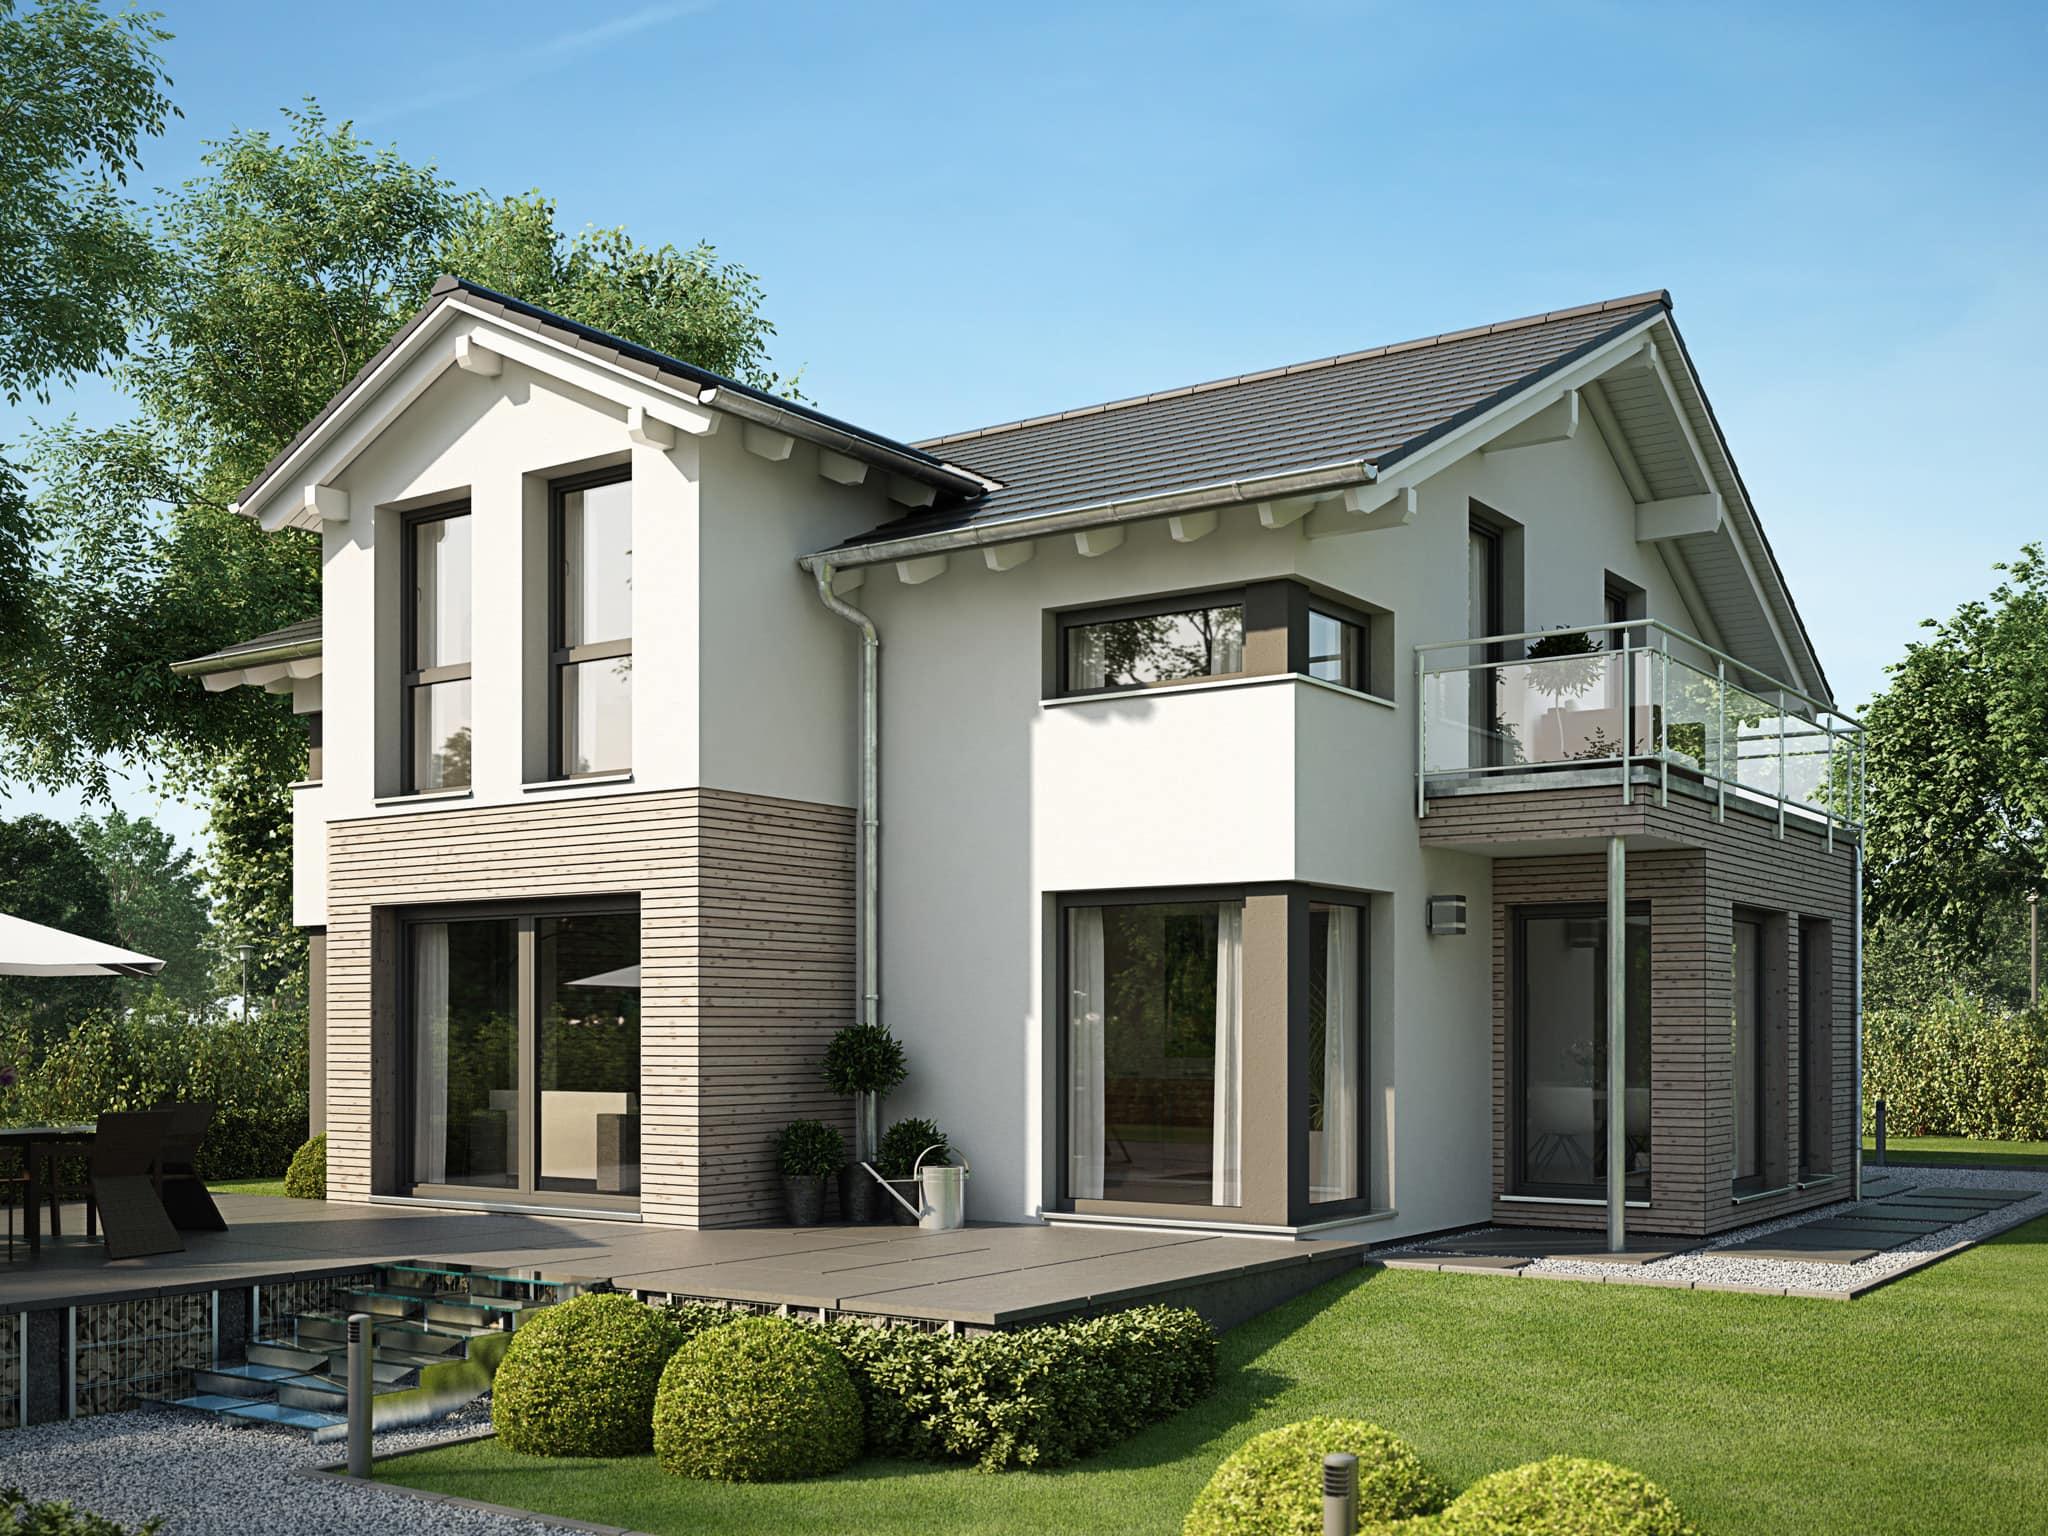 Einfamilienhaus mit Satteldach, Holz Putz Fassade & Giebel - Haus bauen Ideen EVOLUTION 154 V5 Bien Zenker Fertighaus - HausbauDirekt.de